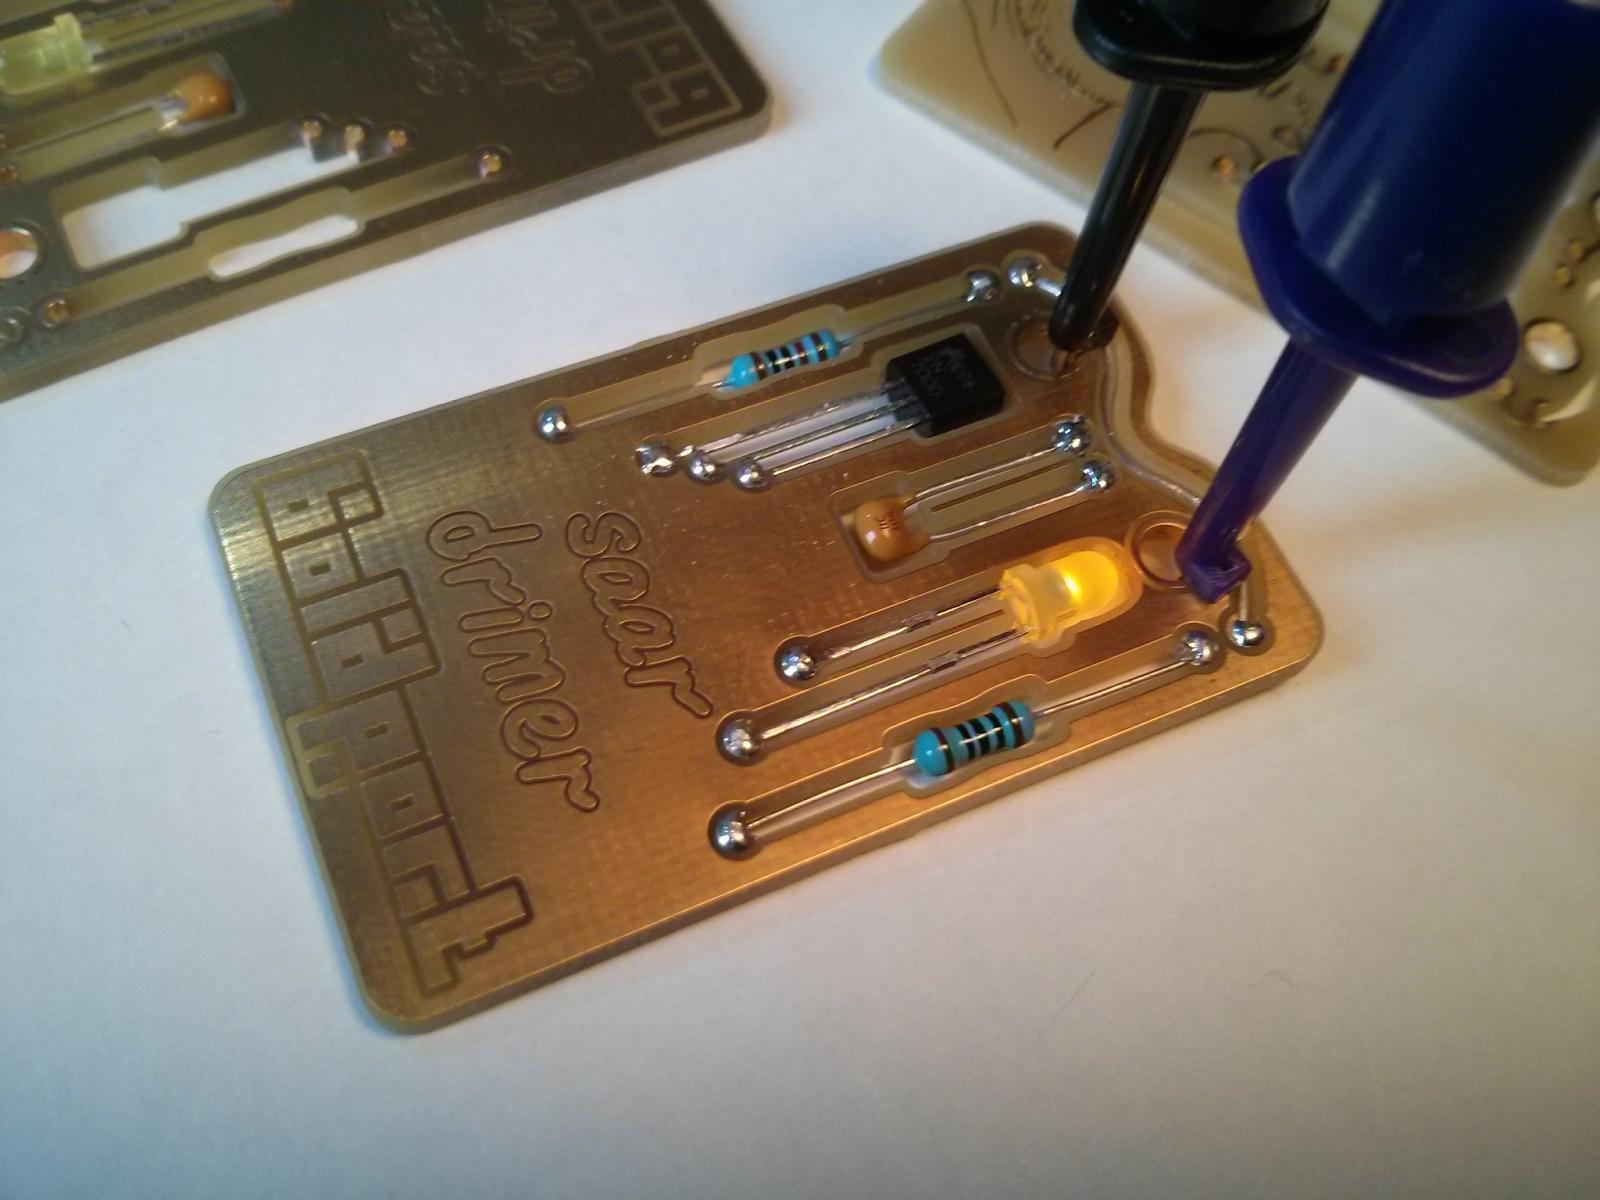 An engineer\'s emergency kit business card | Cool Tech Gear ...